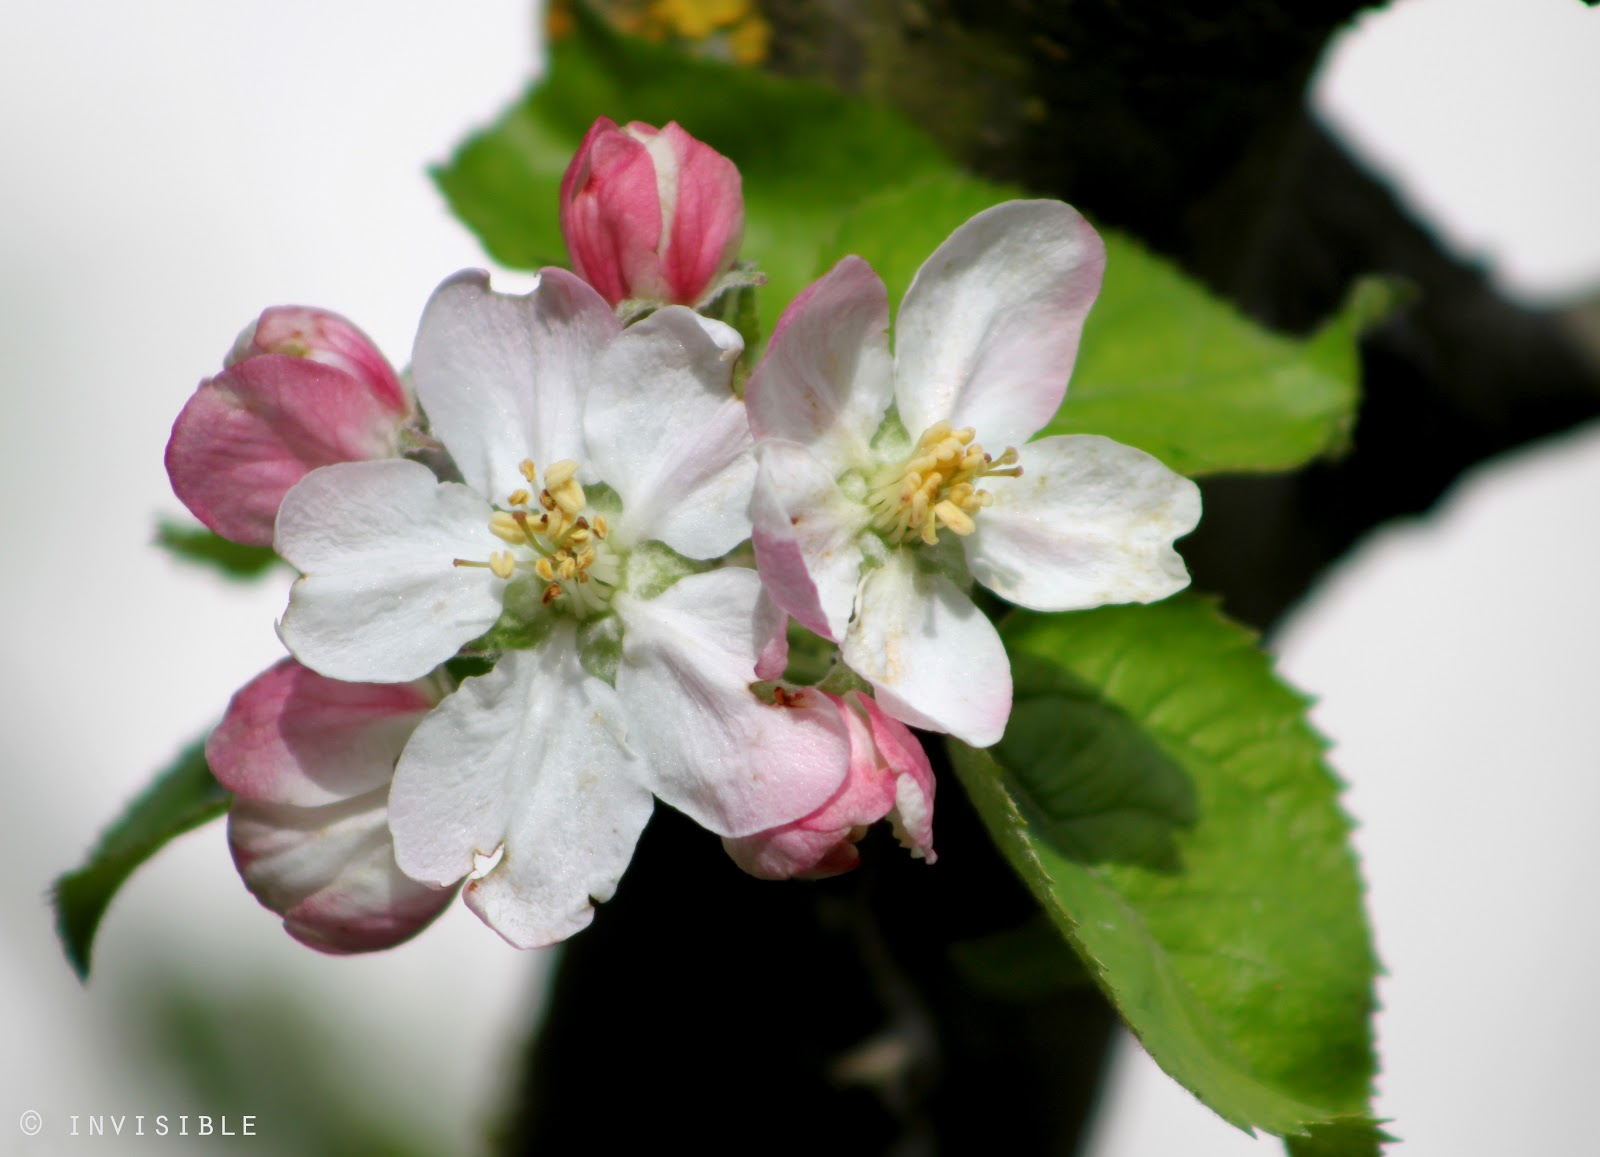 Invisible SLG Photos: Flores del Manzano